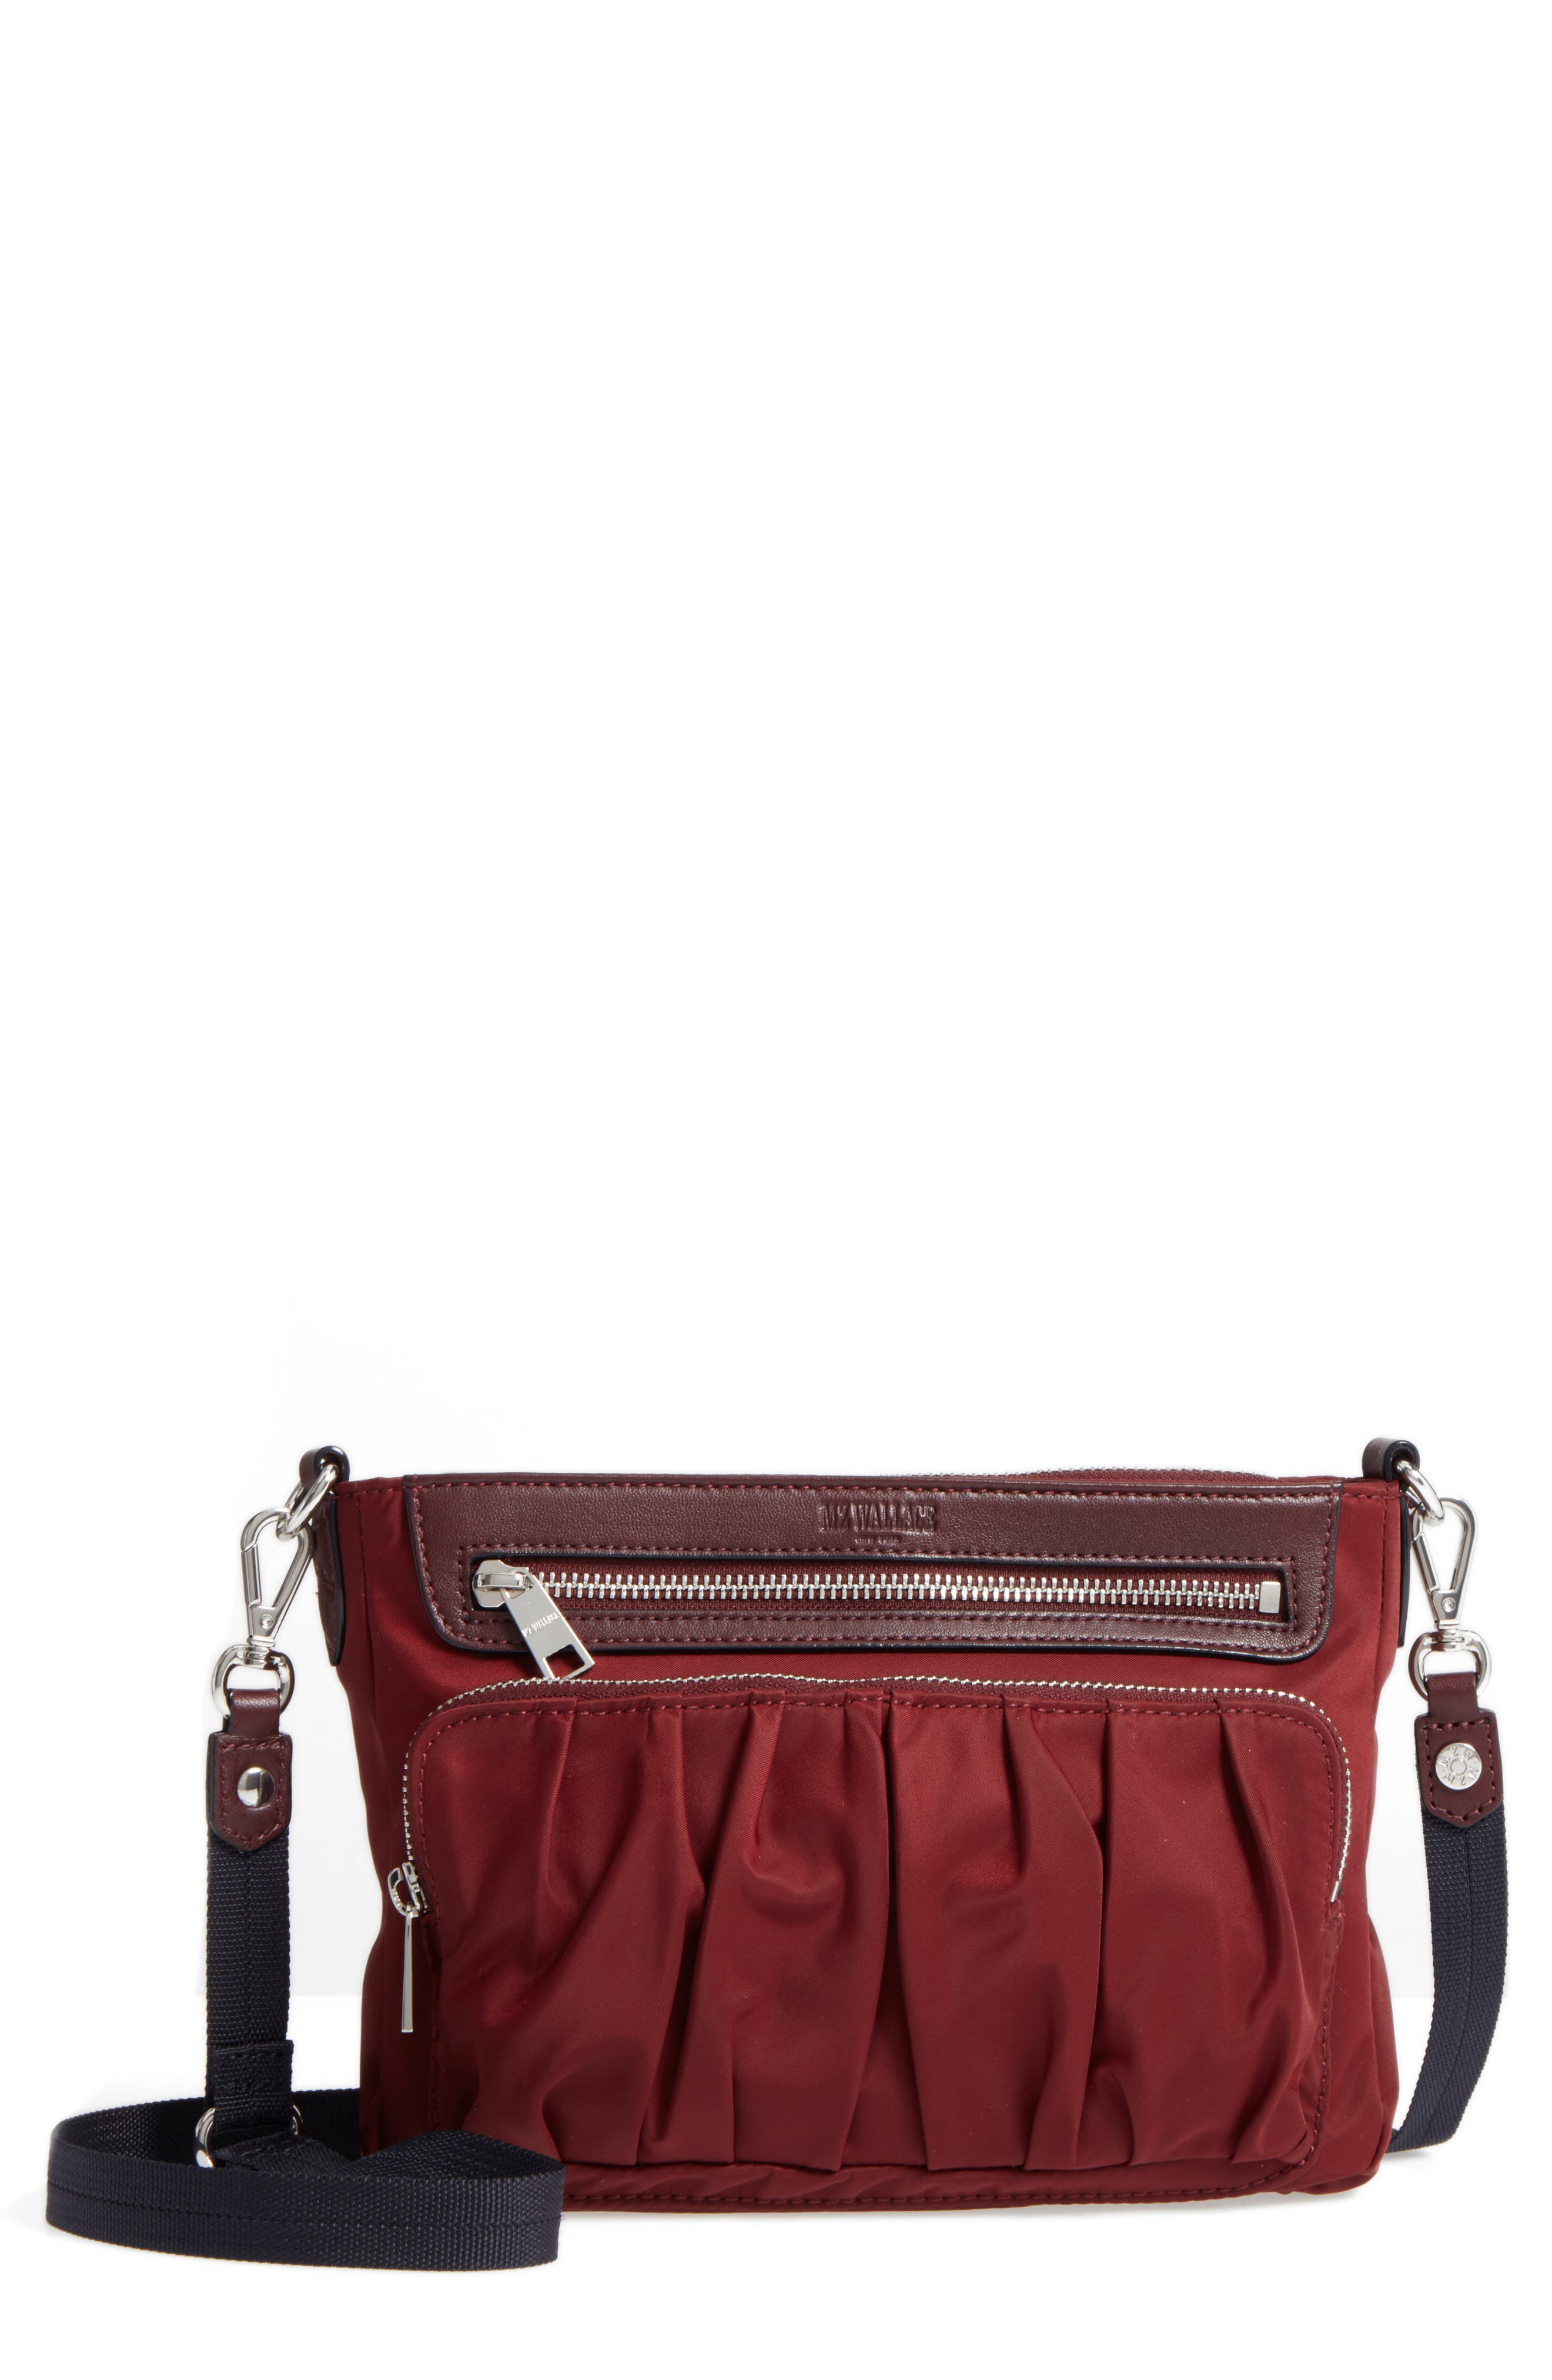 MZ Wallace Abbey Bedford Nylon Crossbody Bag